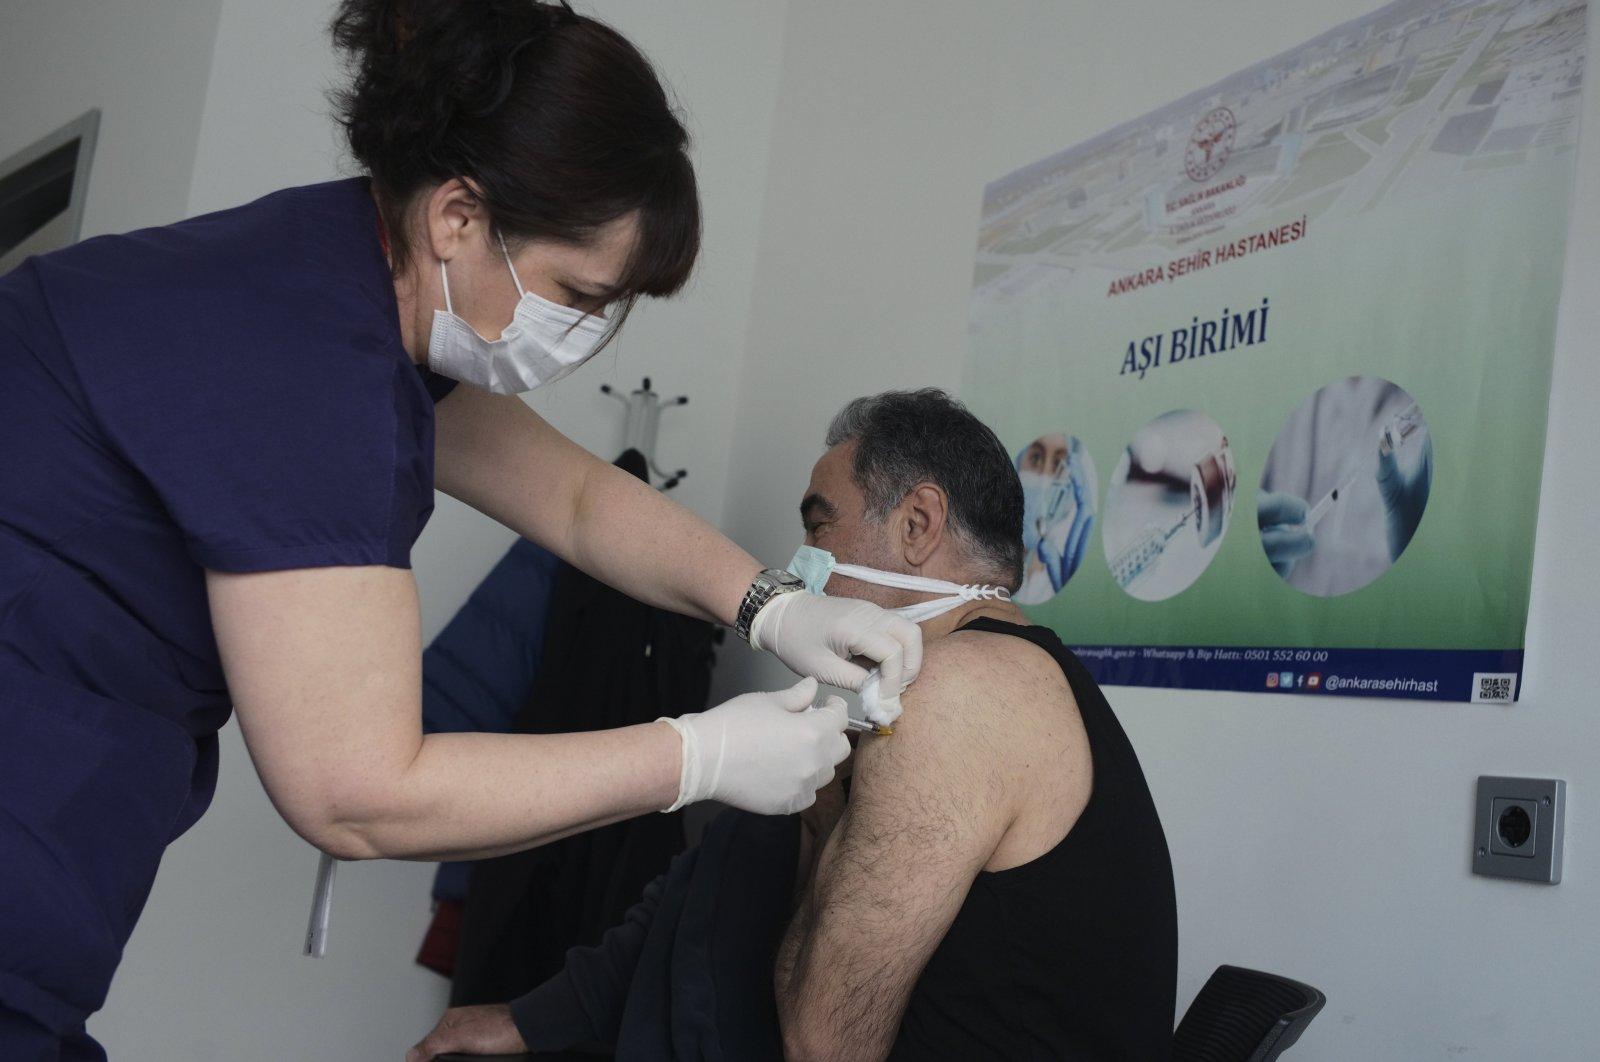 Nurse Fatma Gökçe administers the Pfizer/BioNtech COVID-19 vaccine to a person at a hospital, Ankara, Turkey, Saturday, April 3, 2021. (AP Photo)